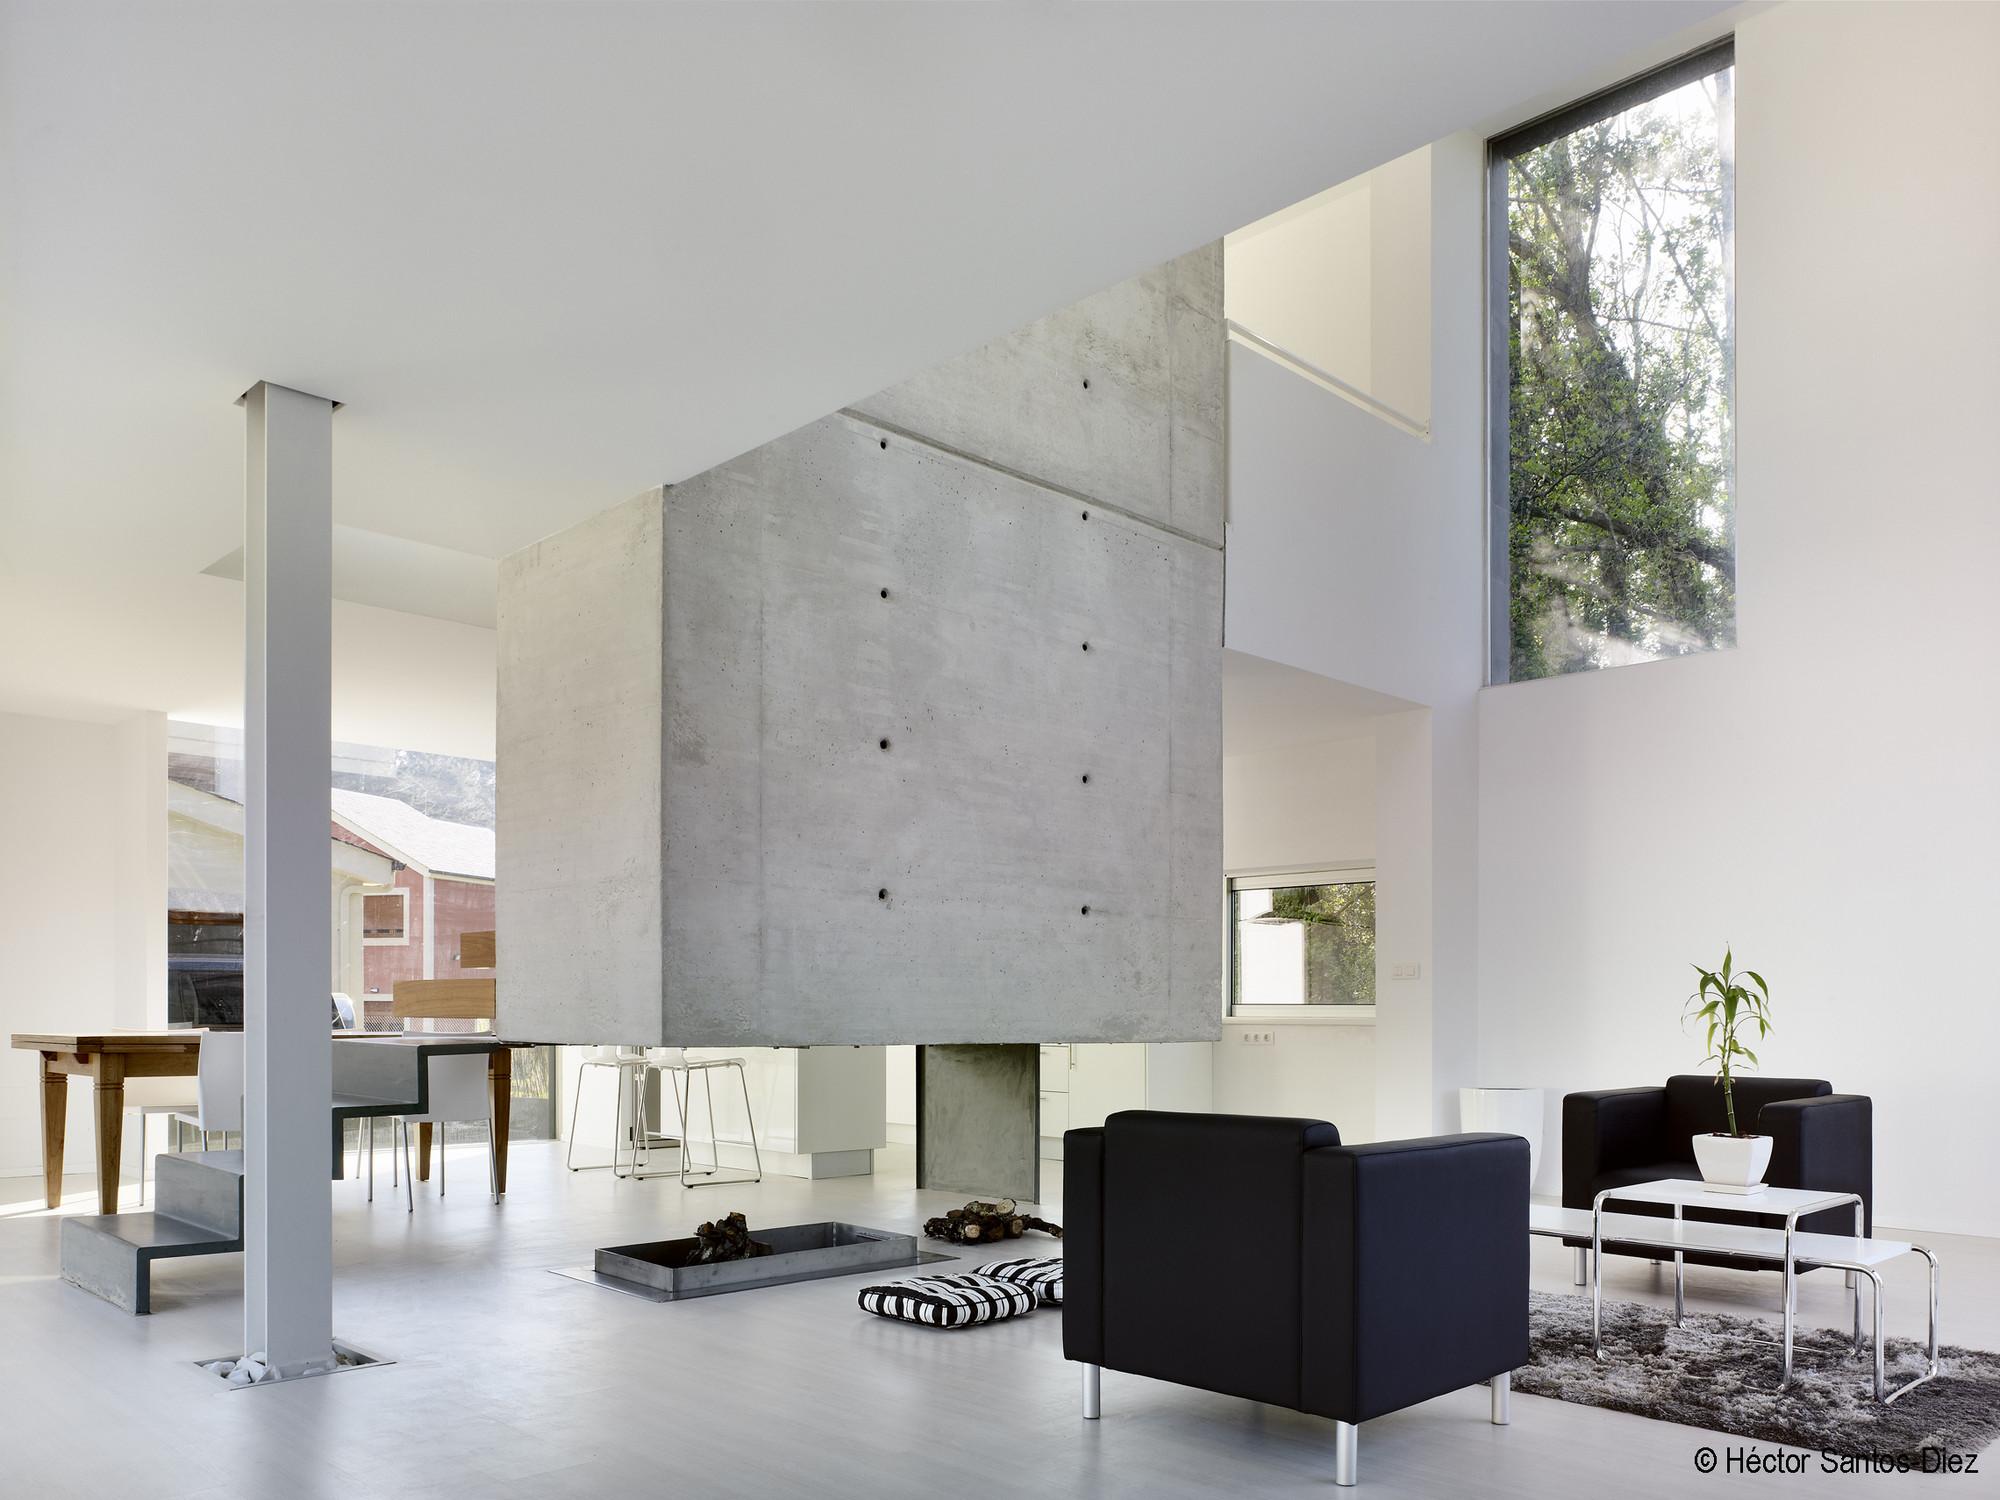 gallery of eins house scar pedr s 7. Black Bedroom Furniture Sets. Home Design Ideas